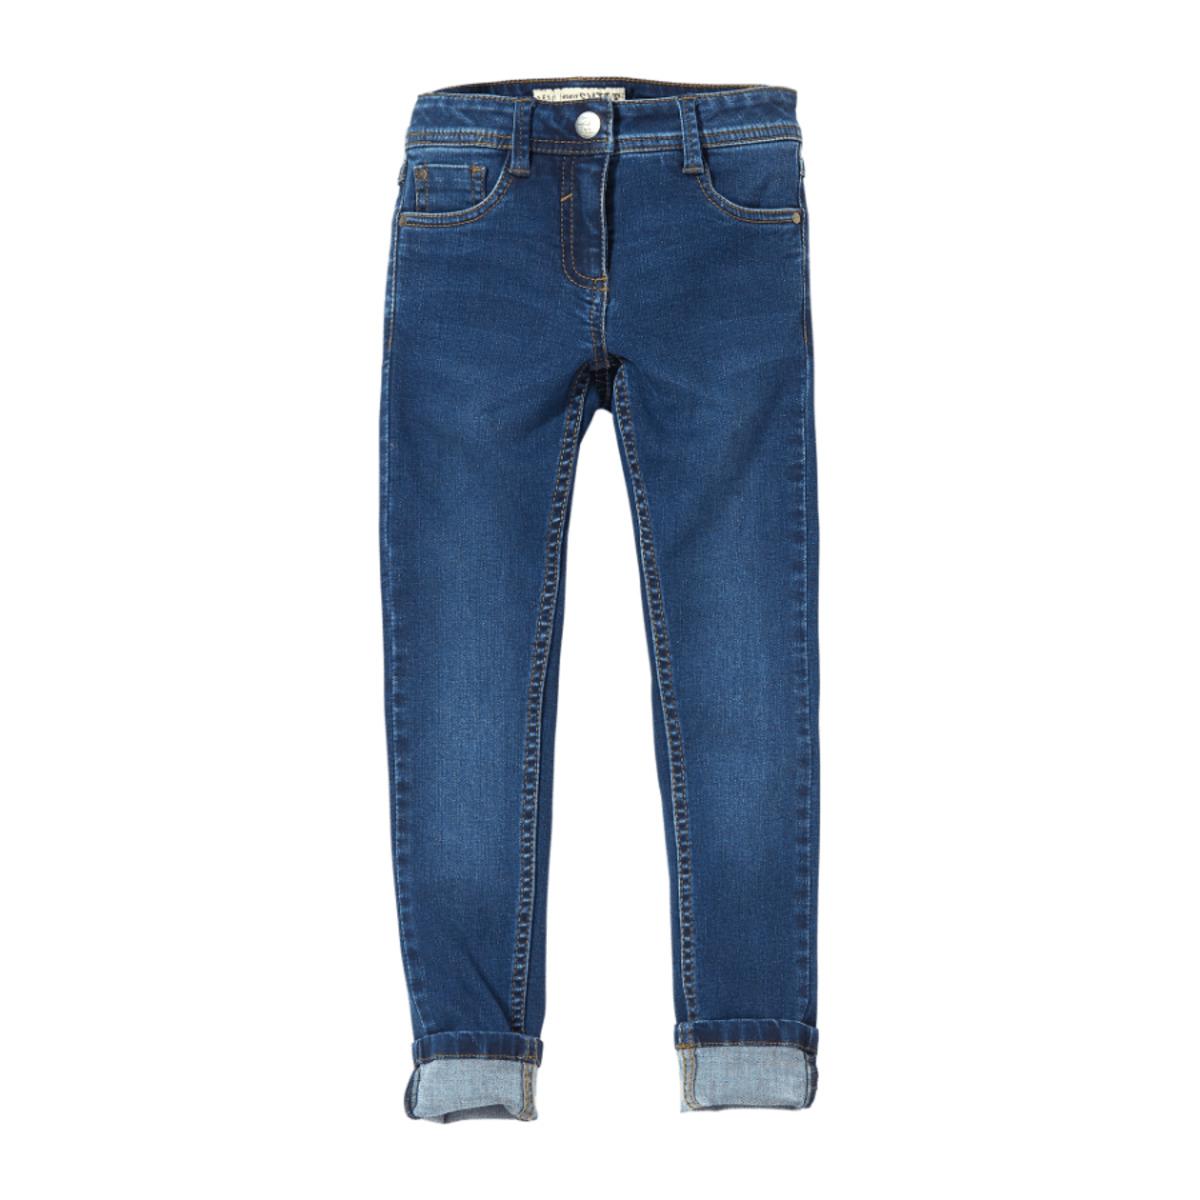 Bild 2 von POCOPIANO     Jeans